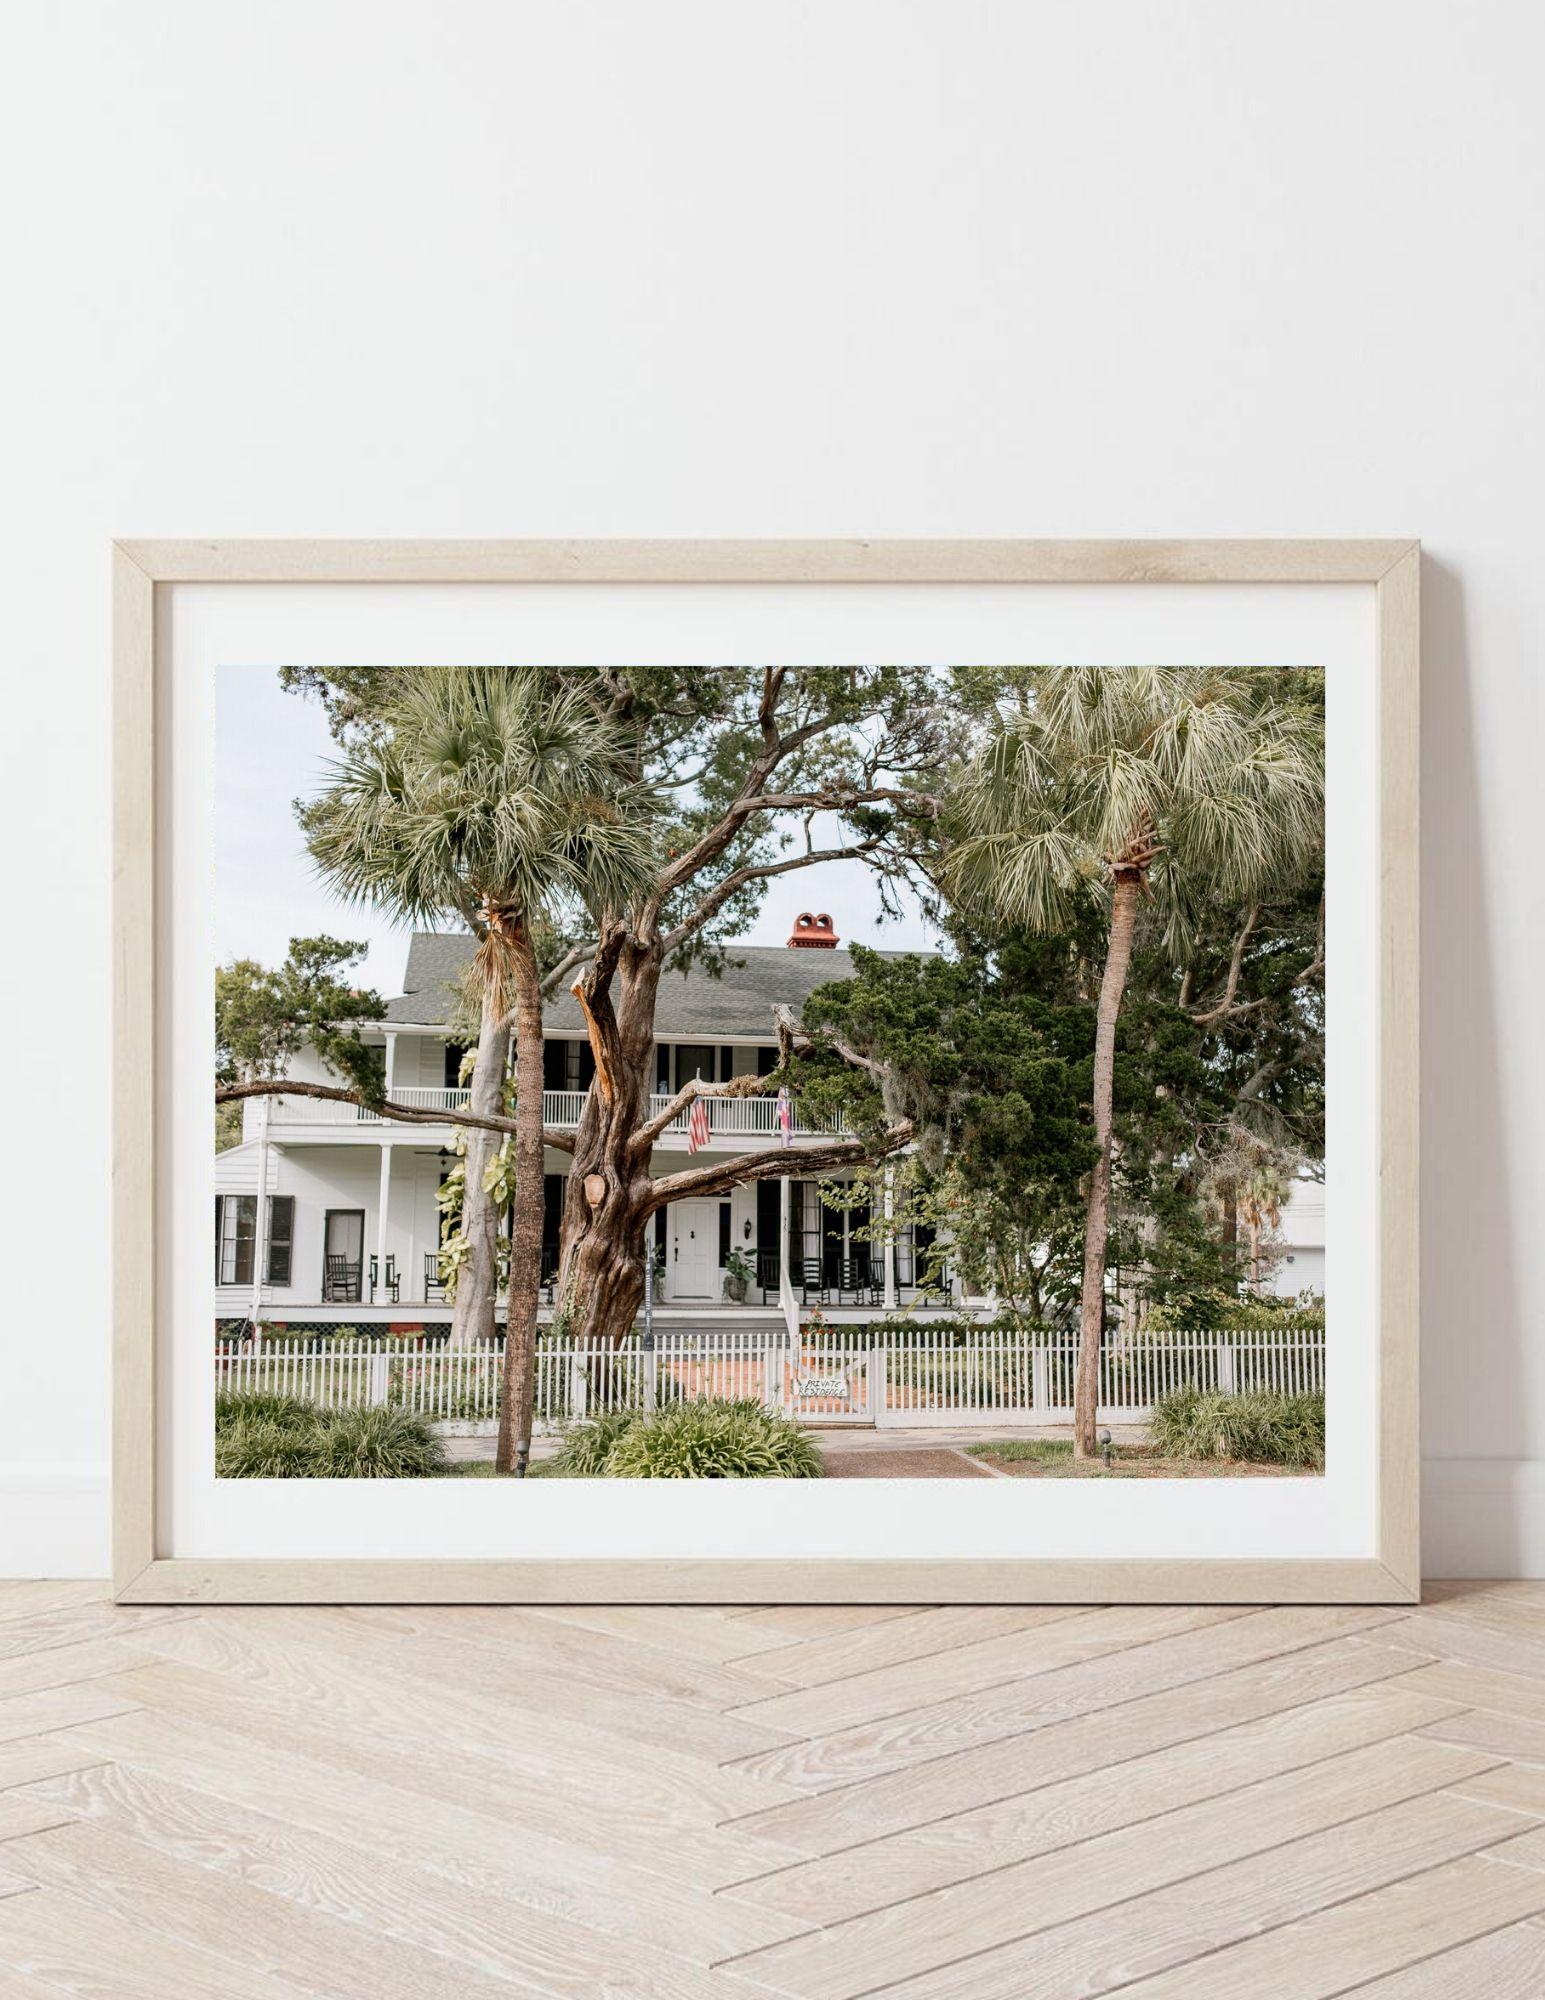 Louella Reese Etsy Shop | Wall Art, Gallery Wall Prints | Amelia Island Print, Southern Beach Home Print | Louella Reese